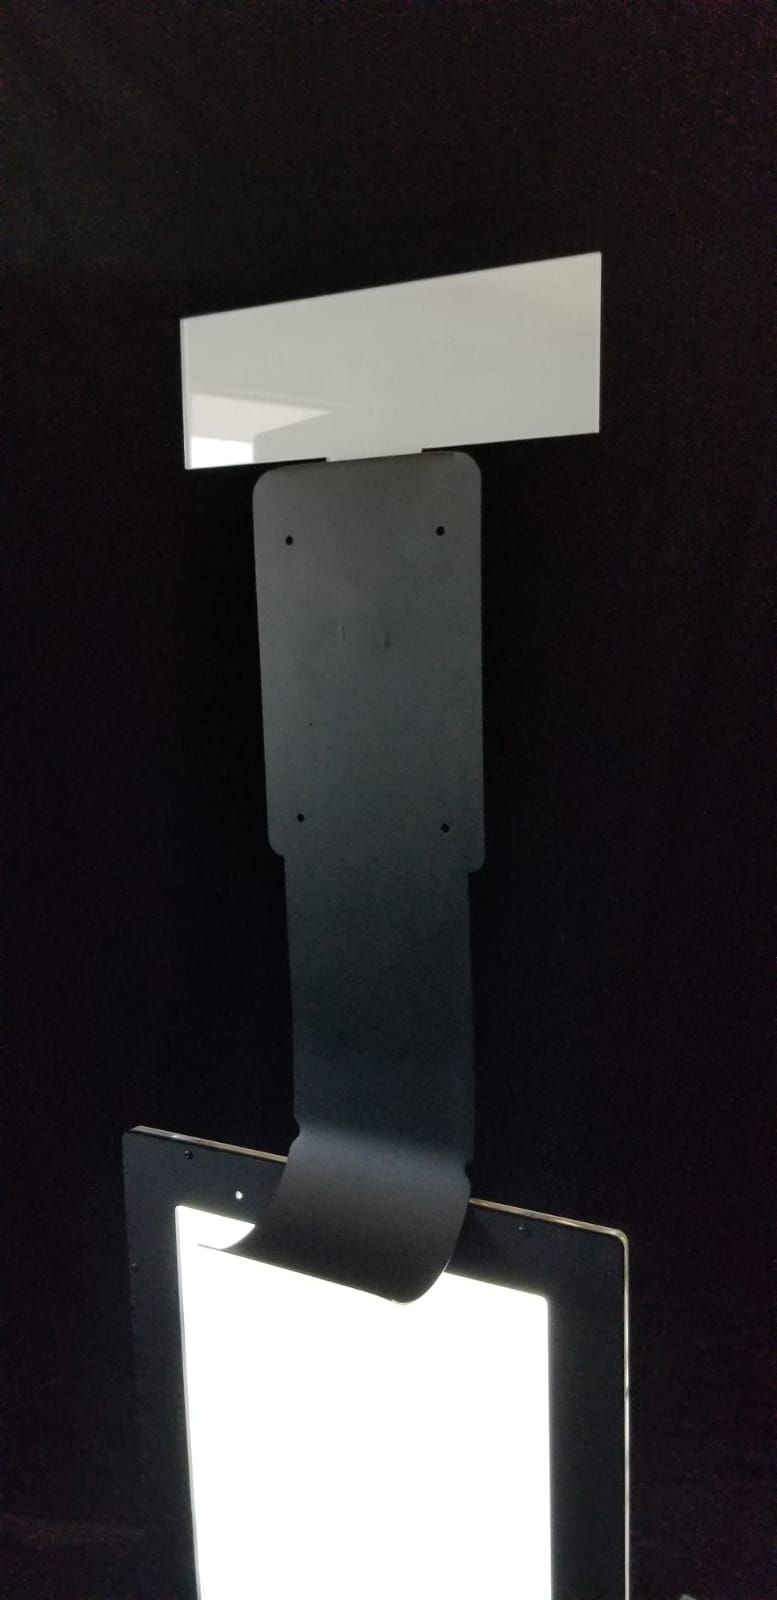 rectangle-top-module-branded-hand-sanitizer-dispenser-stand-saintizing-station.jpg